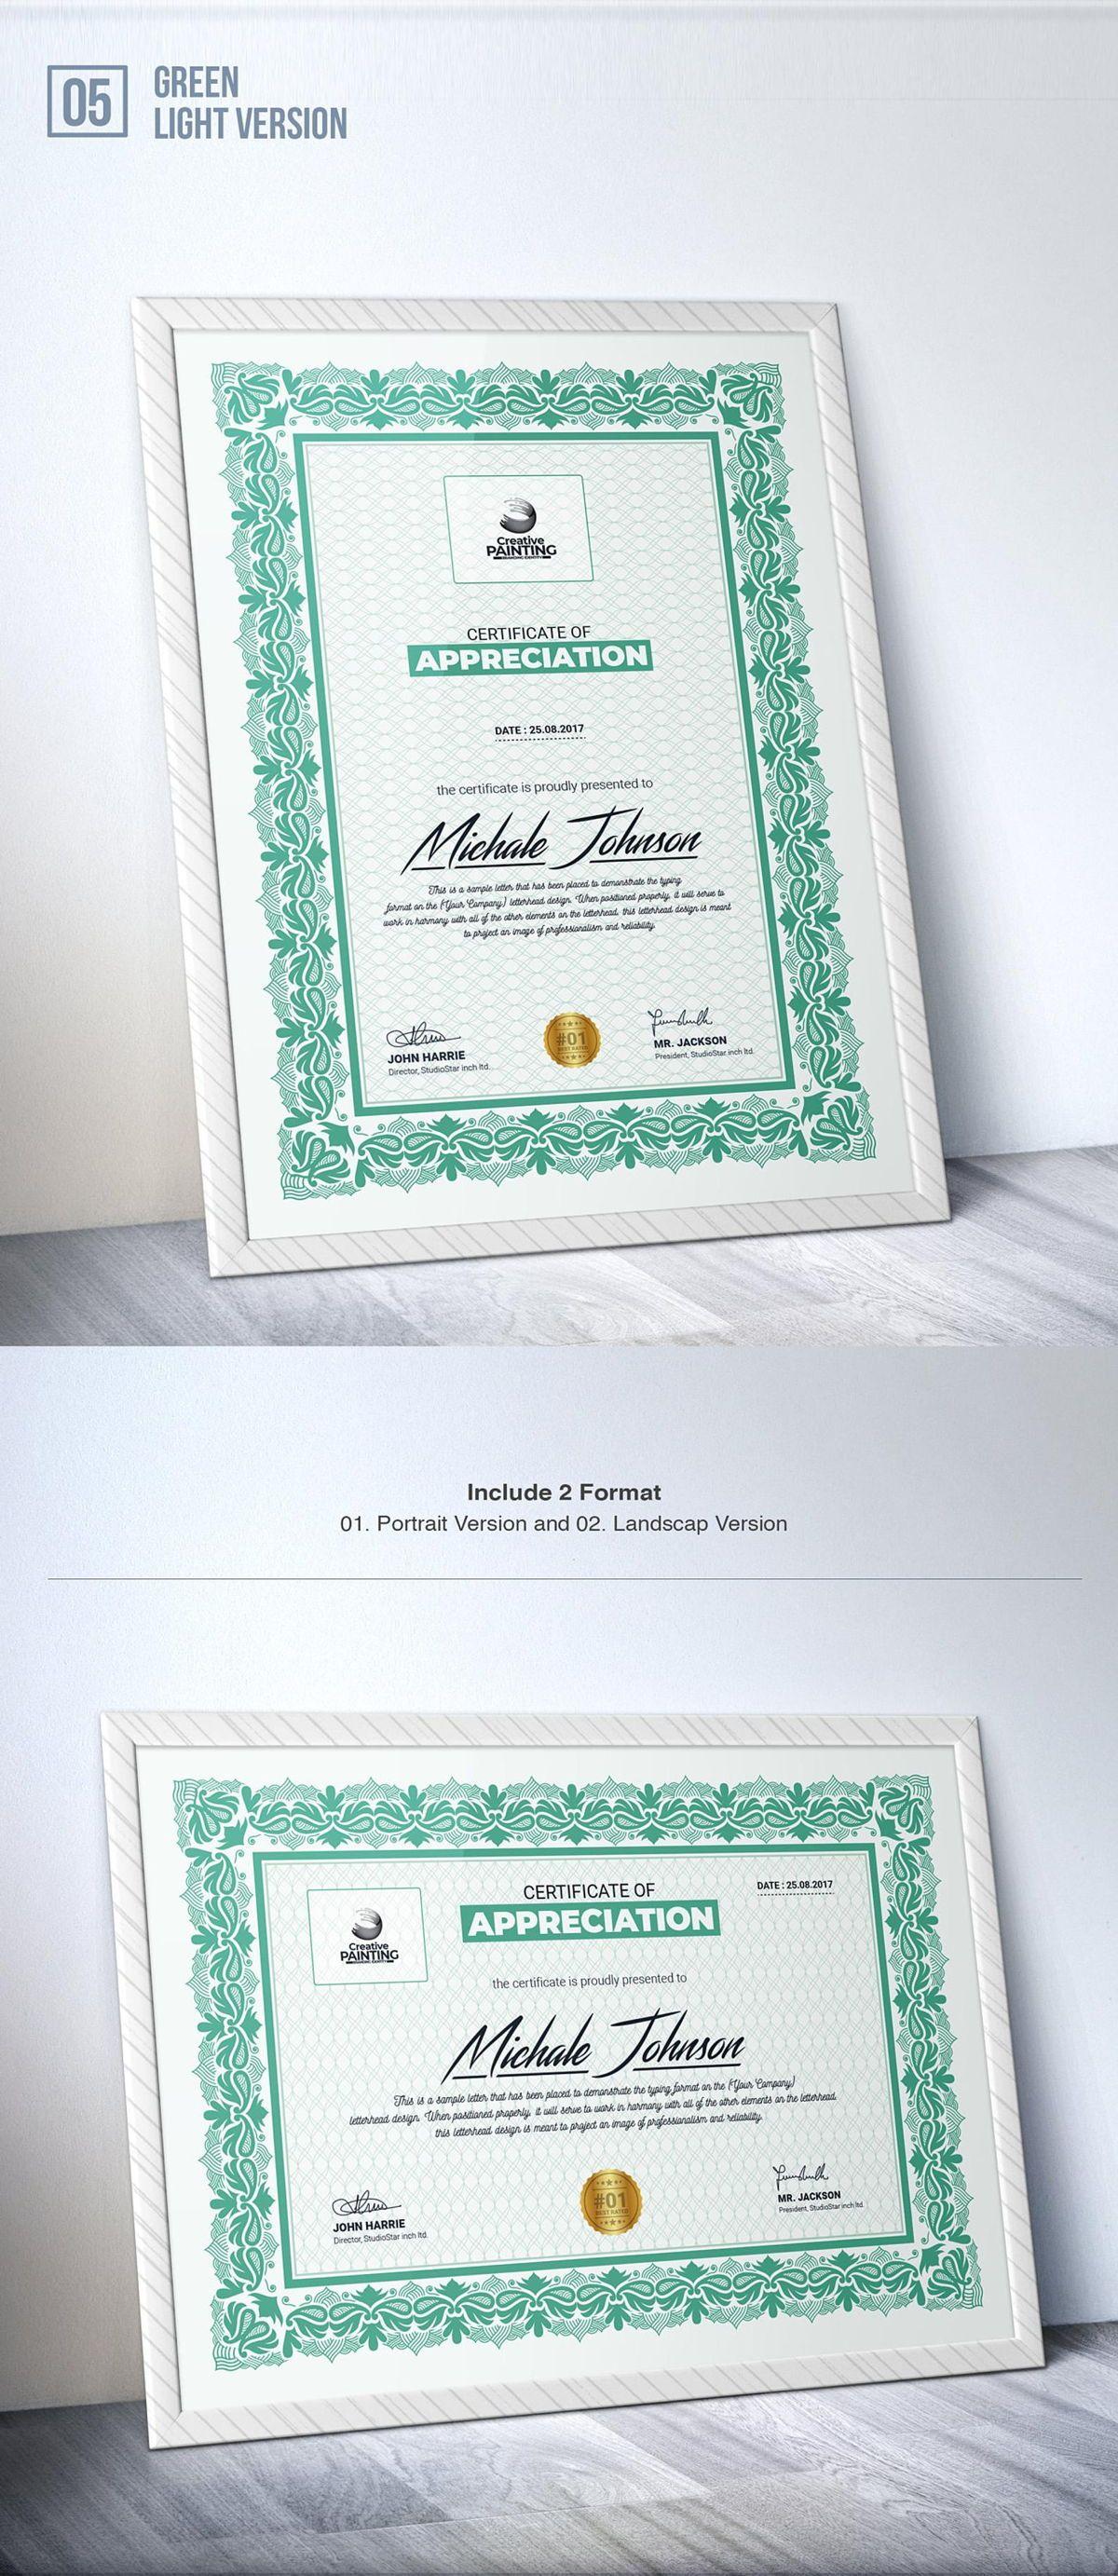 Creative Painting Certificate - 8 Colors - Dark and Light Version, Slide 7, 08755, Business — PoweredTemplate.com